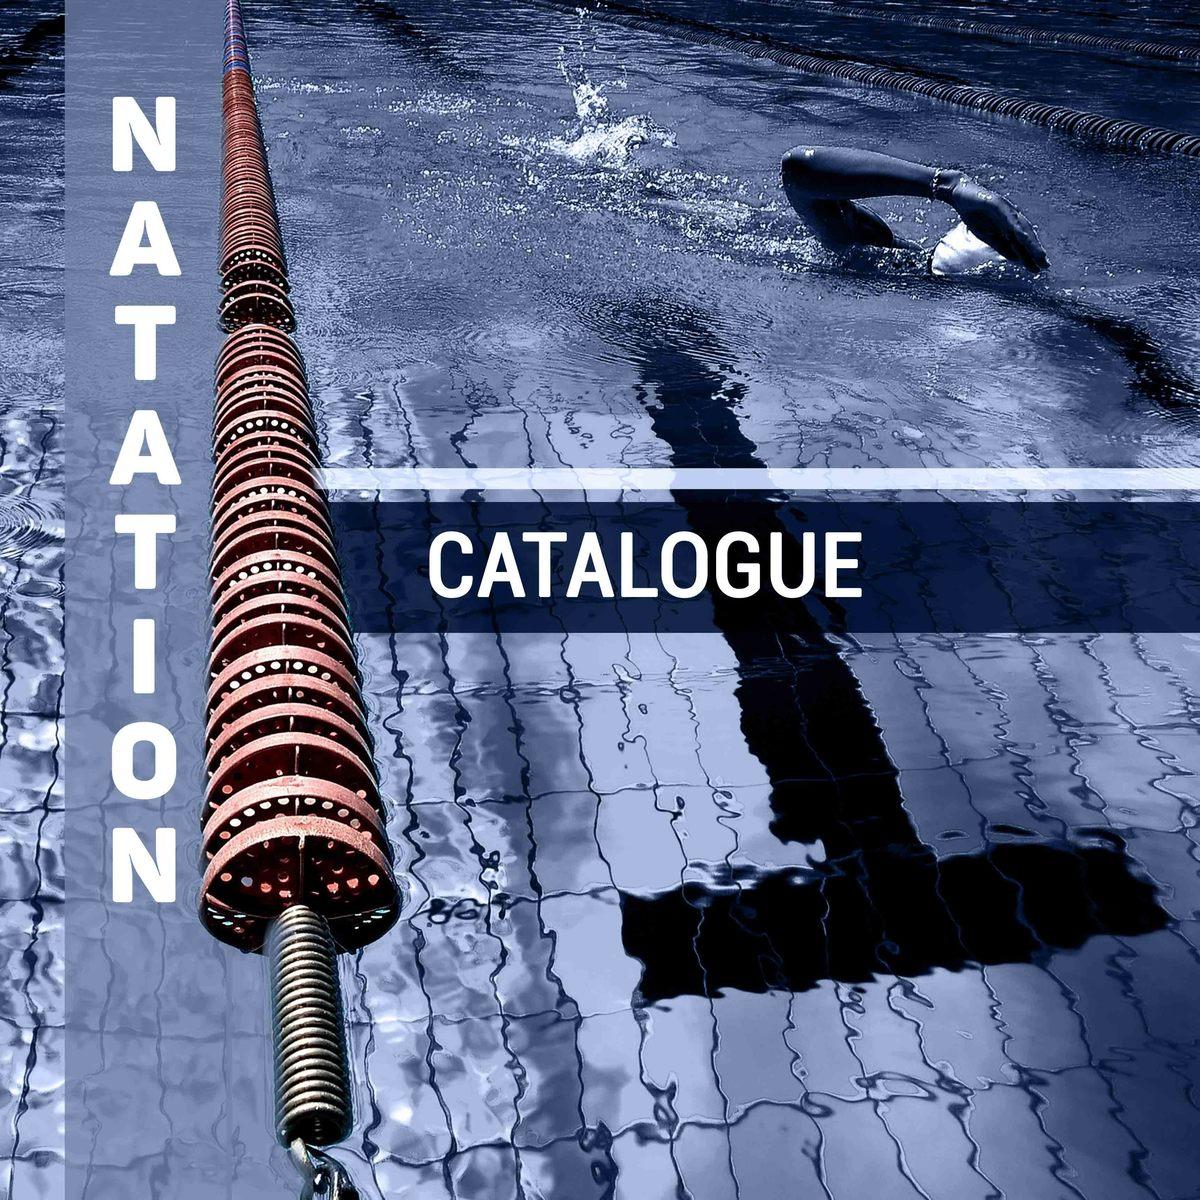 Image_catalogue-natation-pre_sentation-1--0-0--736dc036-77c4-47d0-928a-77da1aa9c5b5